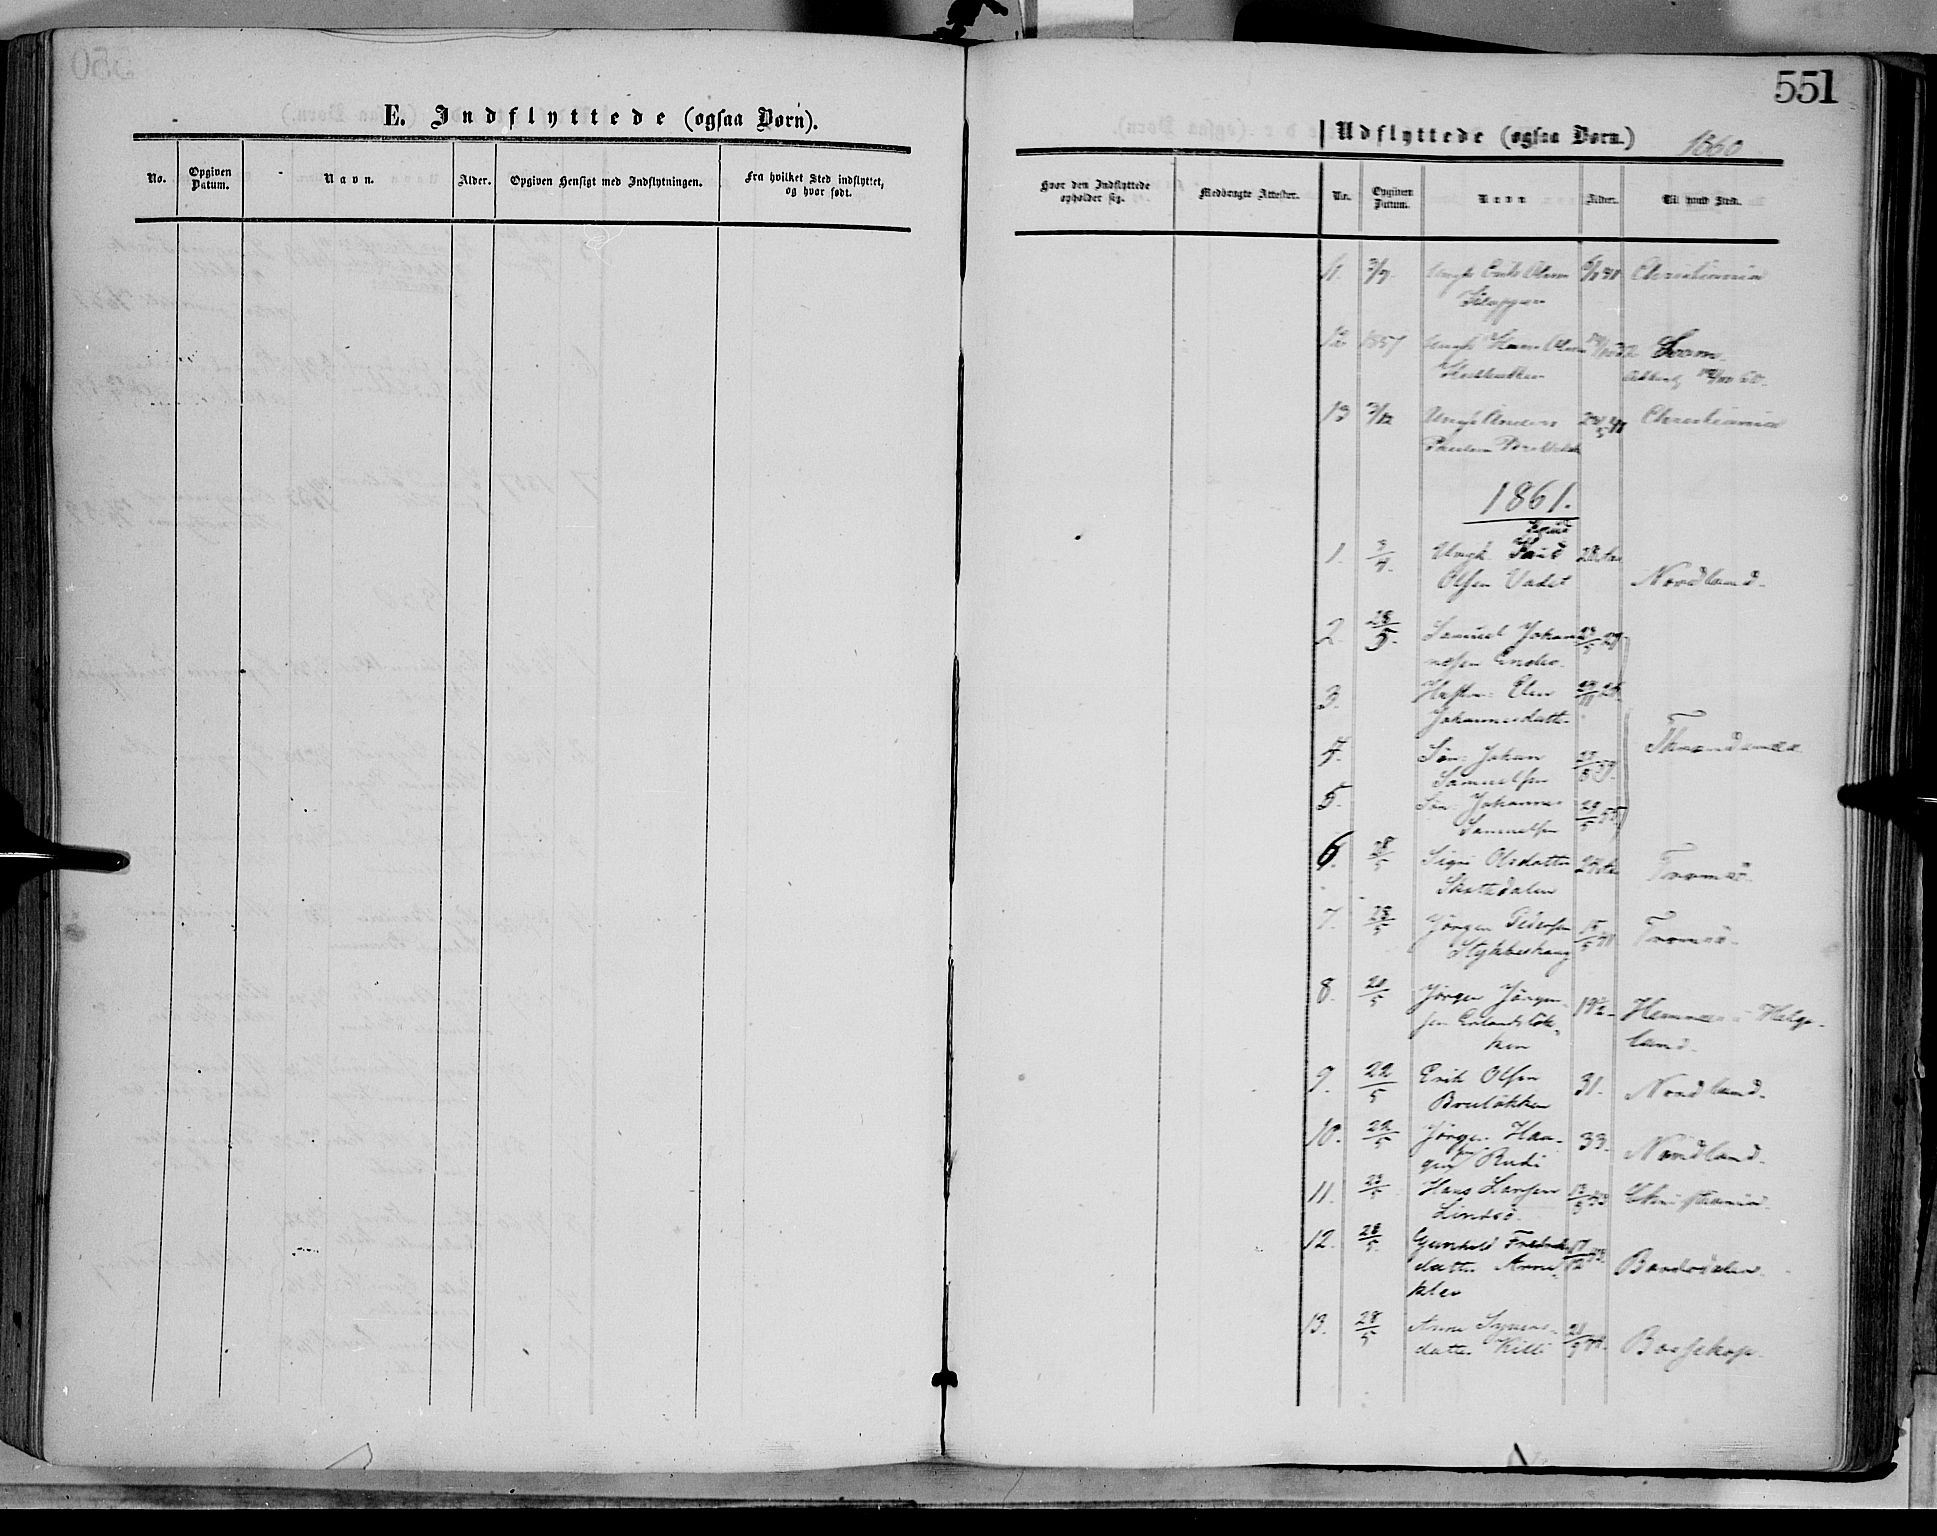 SAH, Dovre prestekontor, Ministerialbok nr. 1, 1854-1878, s. 551